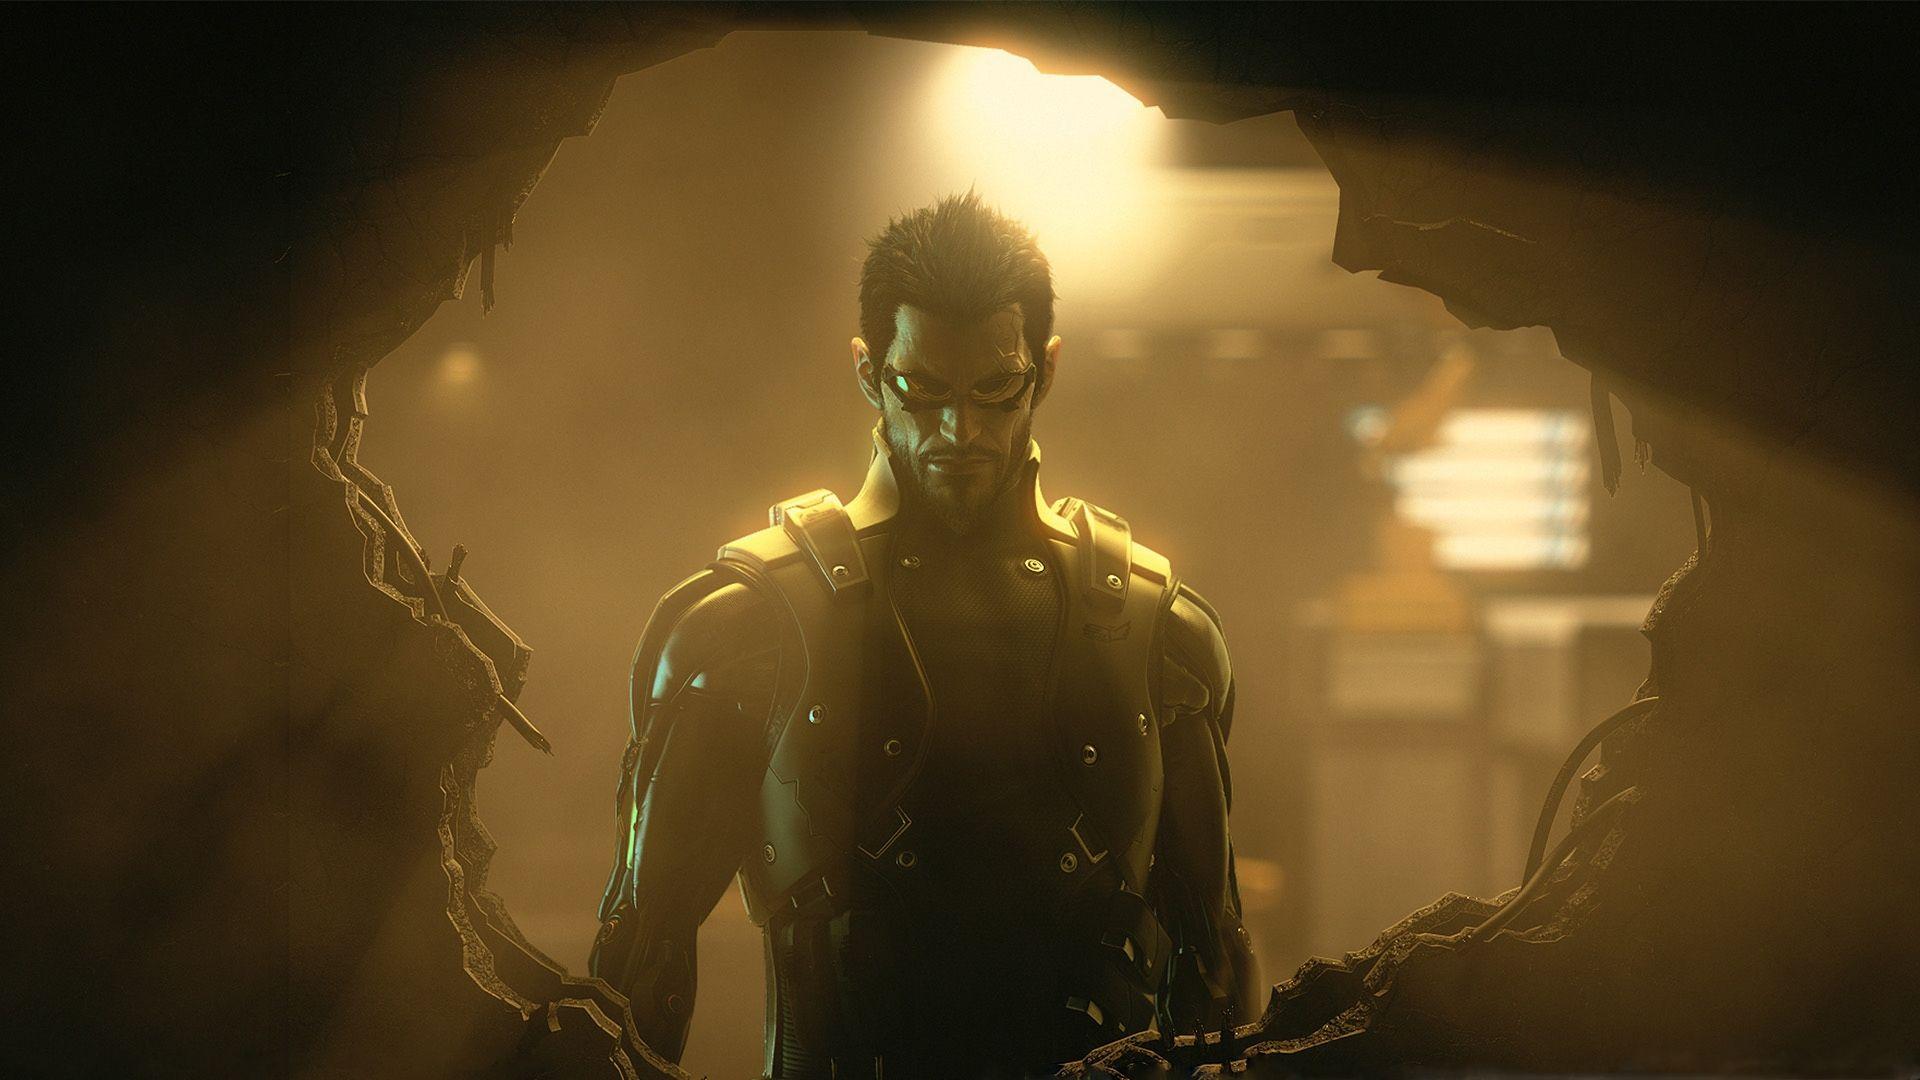 Amazing Deus Ex Adam Jensen Light Wall Glasses Wallpaper